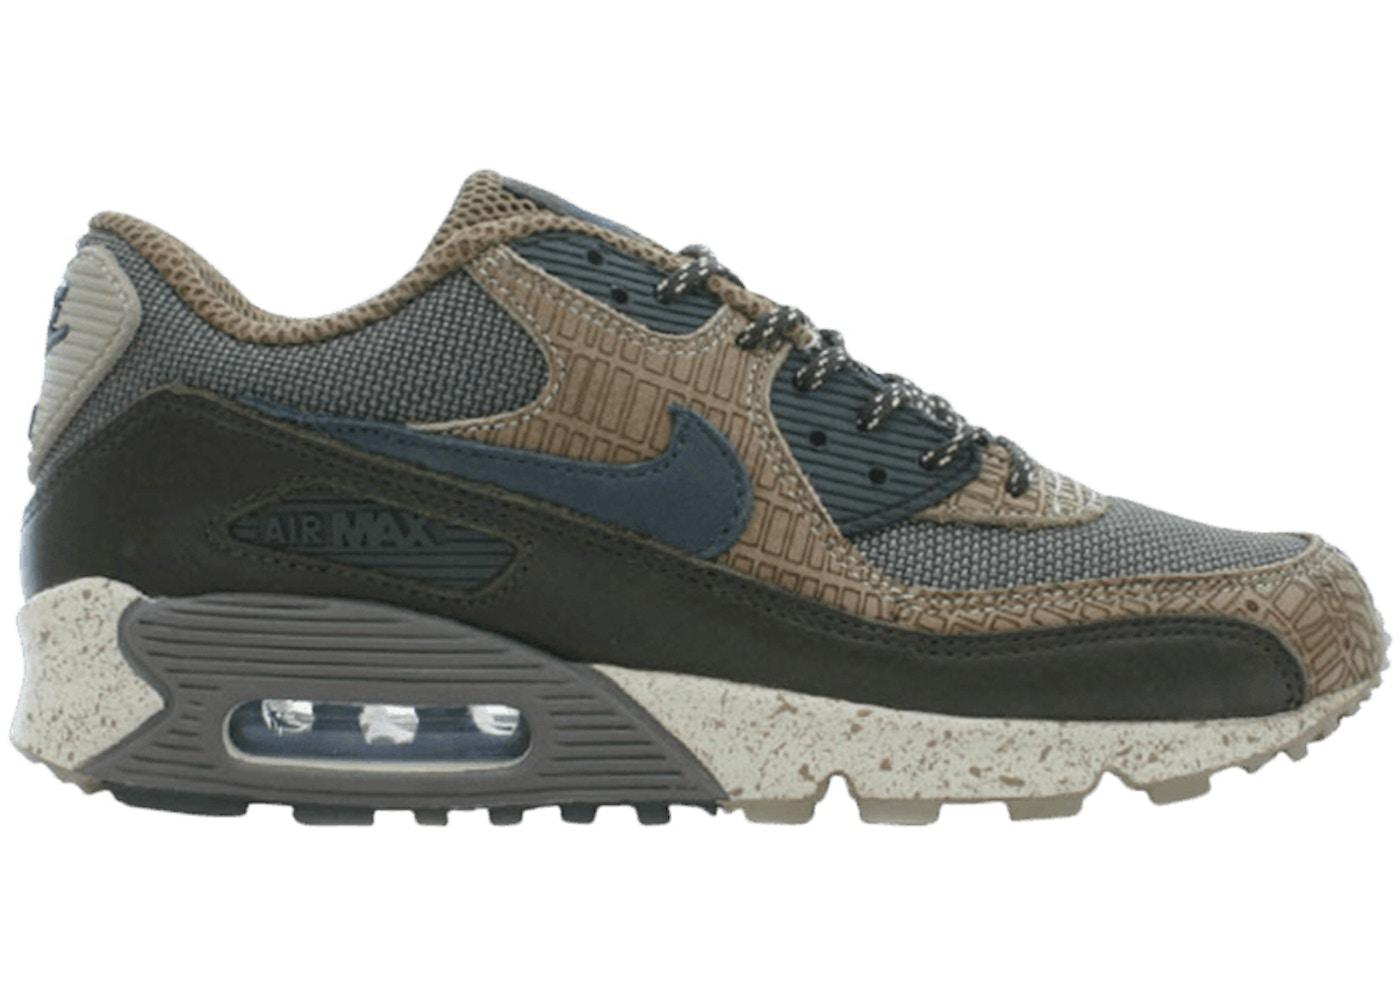 centavo tengo hambre Ánimo  Nike Staple x Air Max 90 Premium Navigation - 308856-001